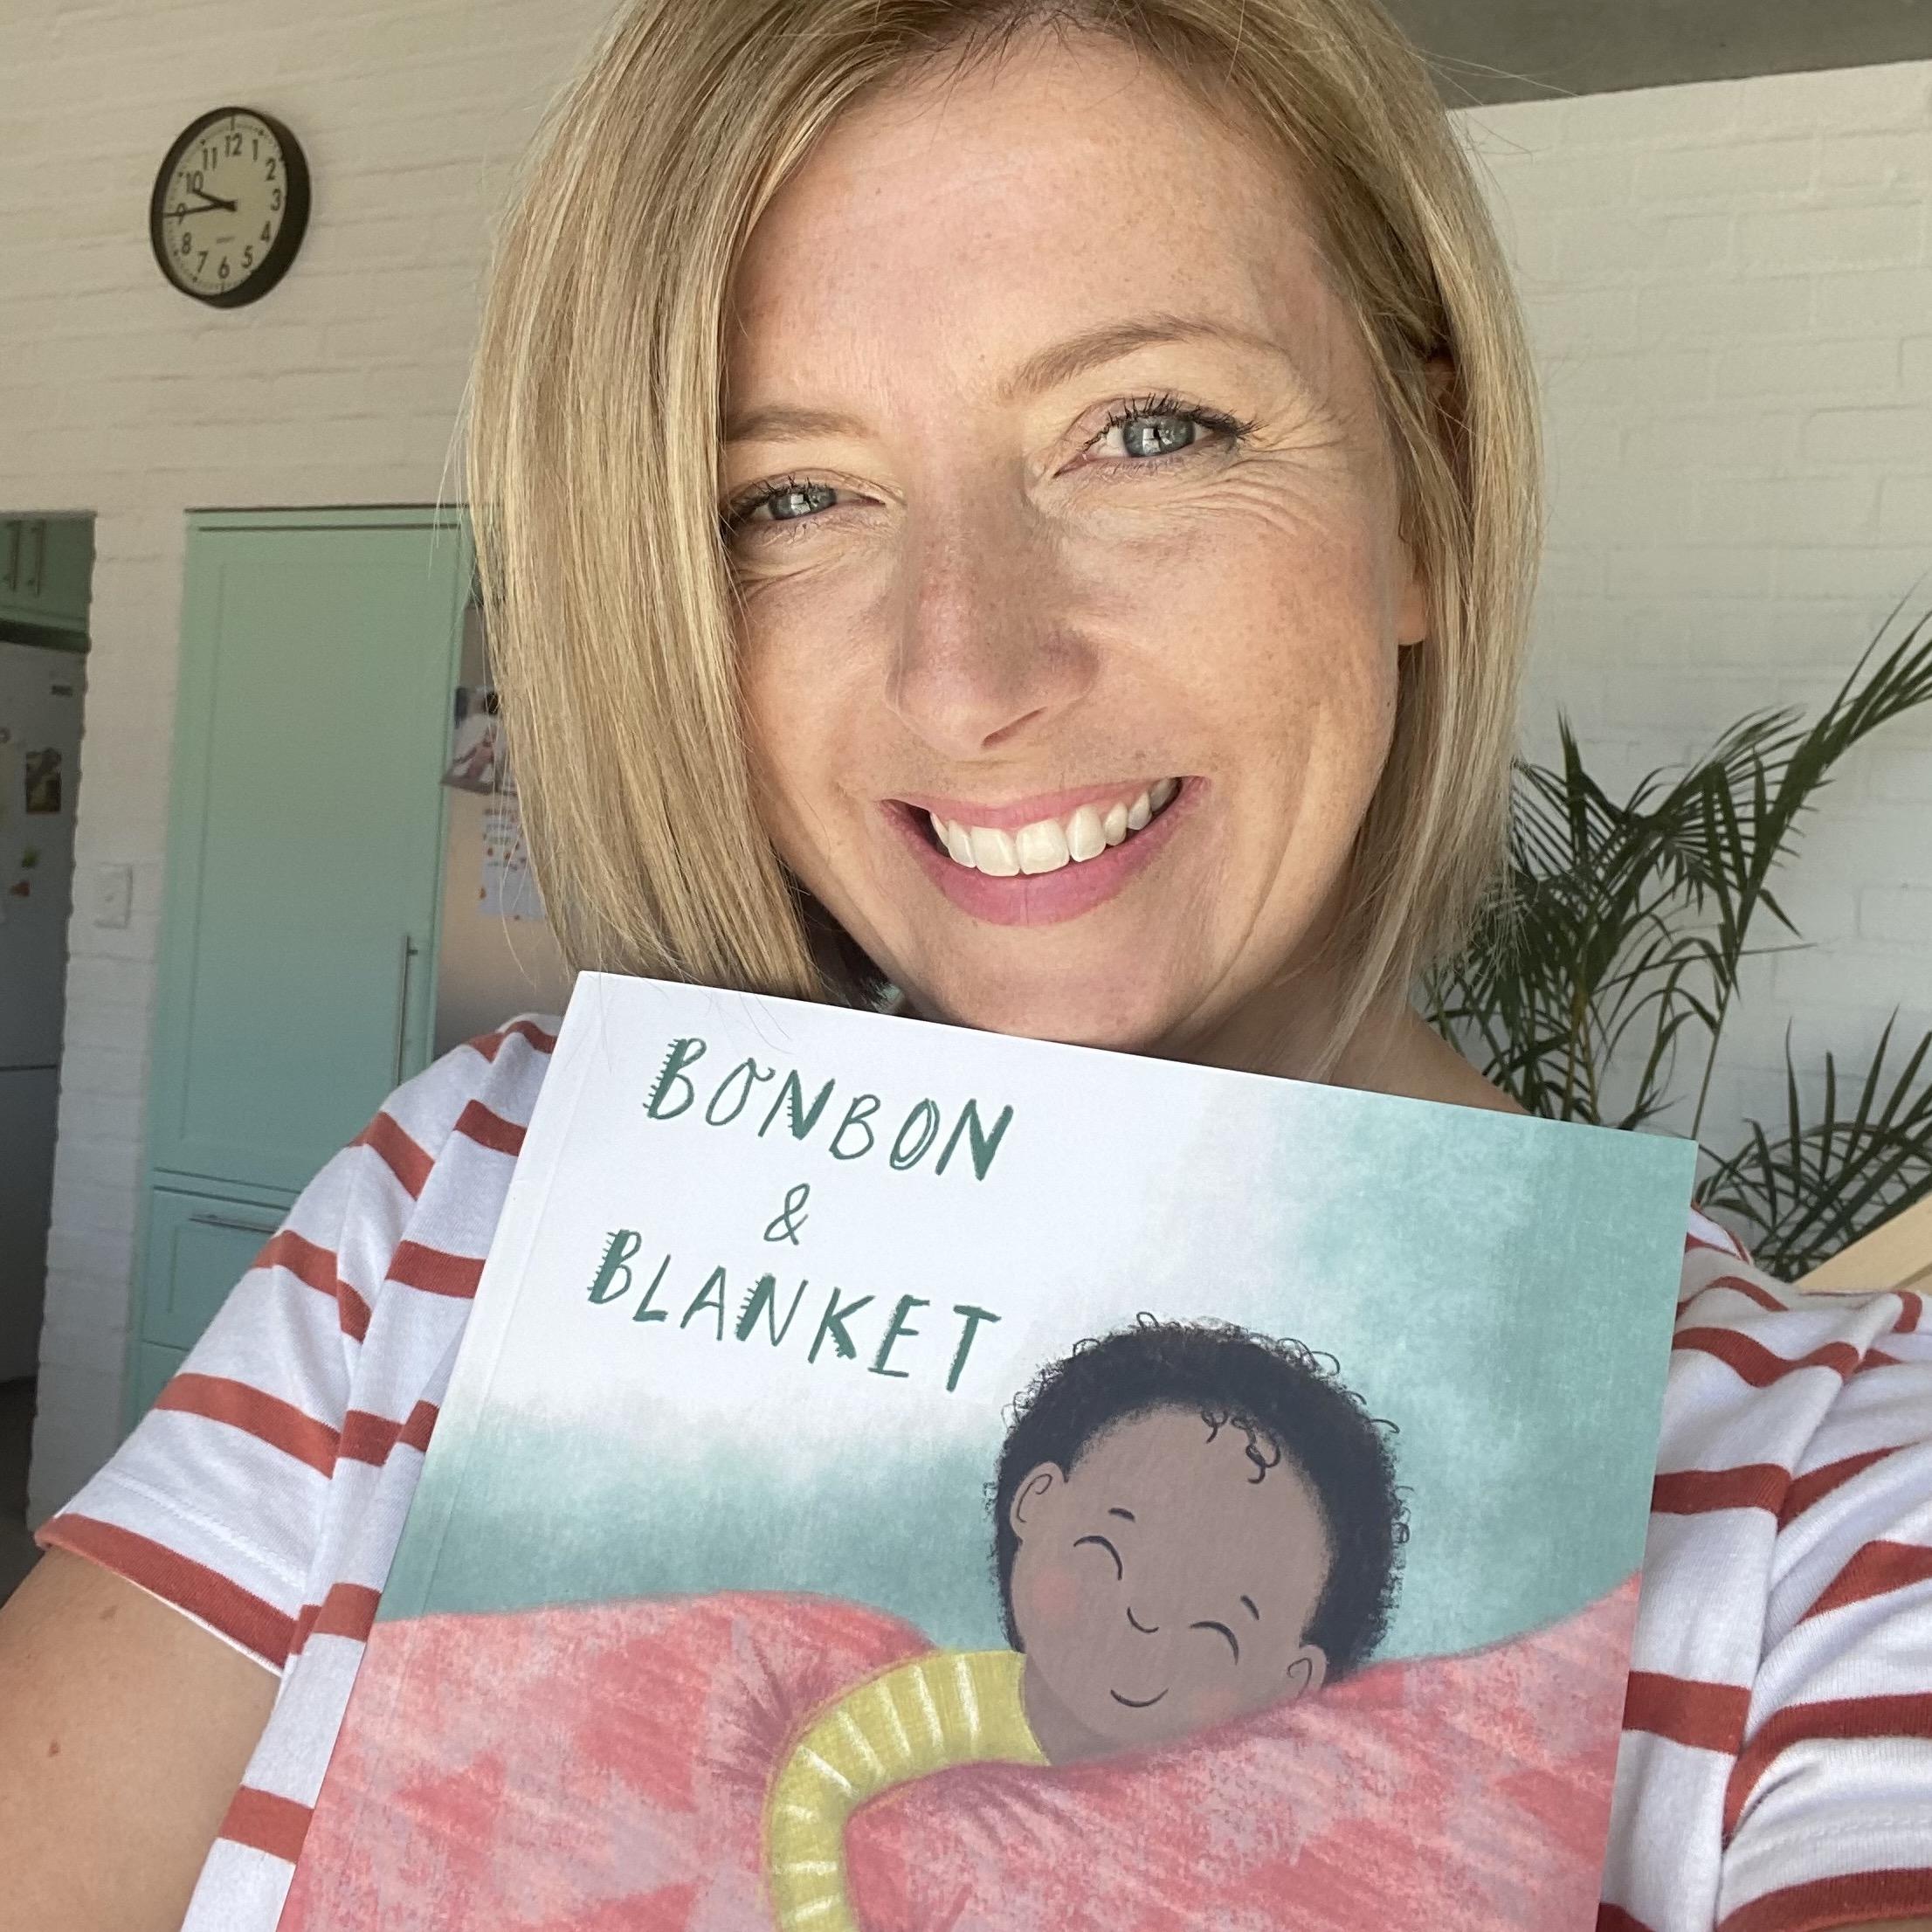 Author Emily House with new book Bonbon & Blanket